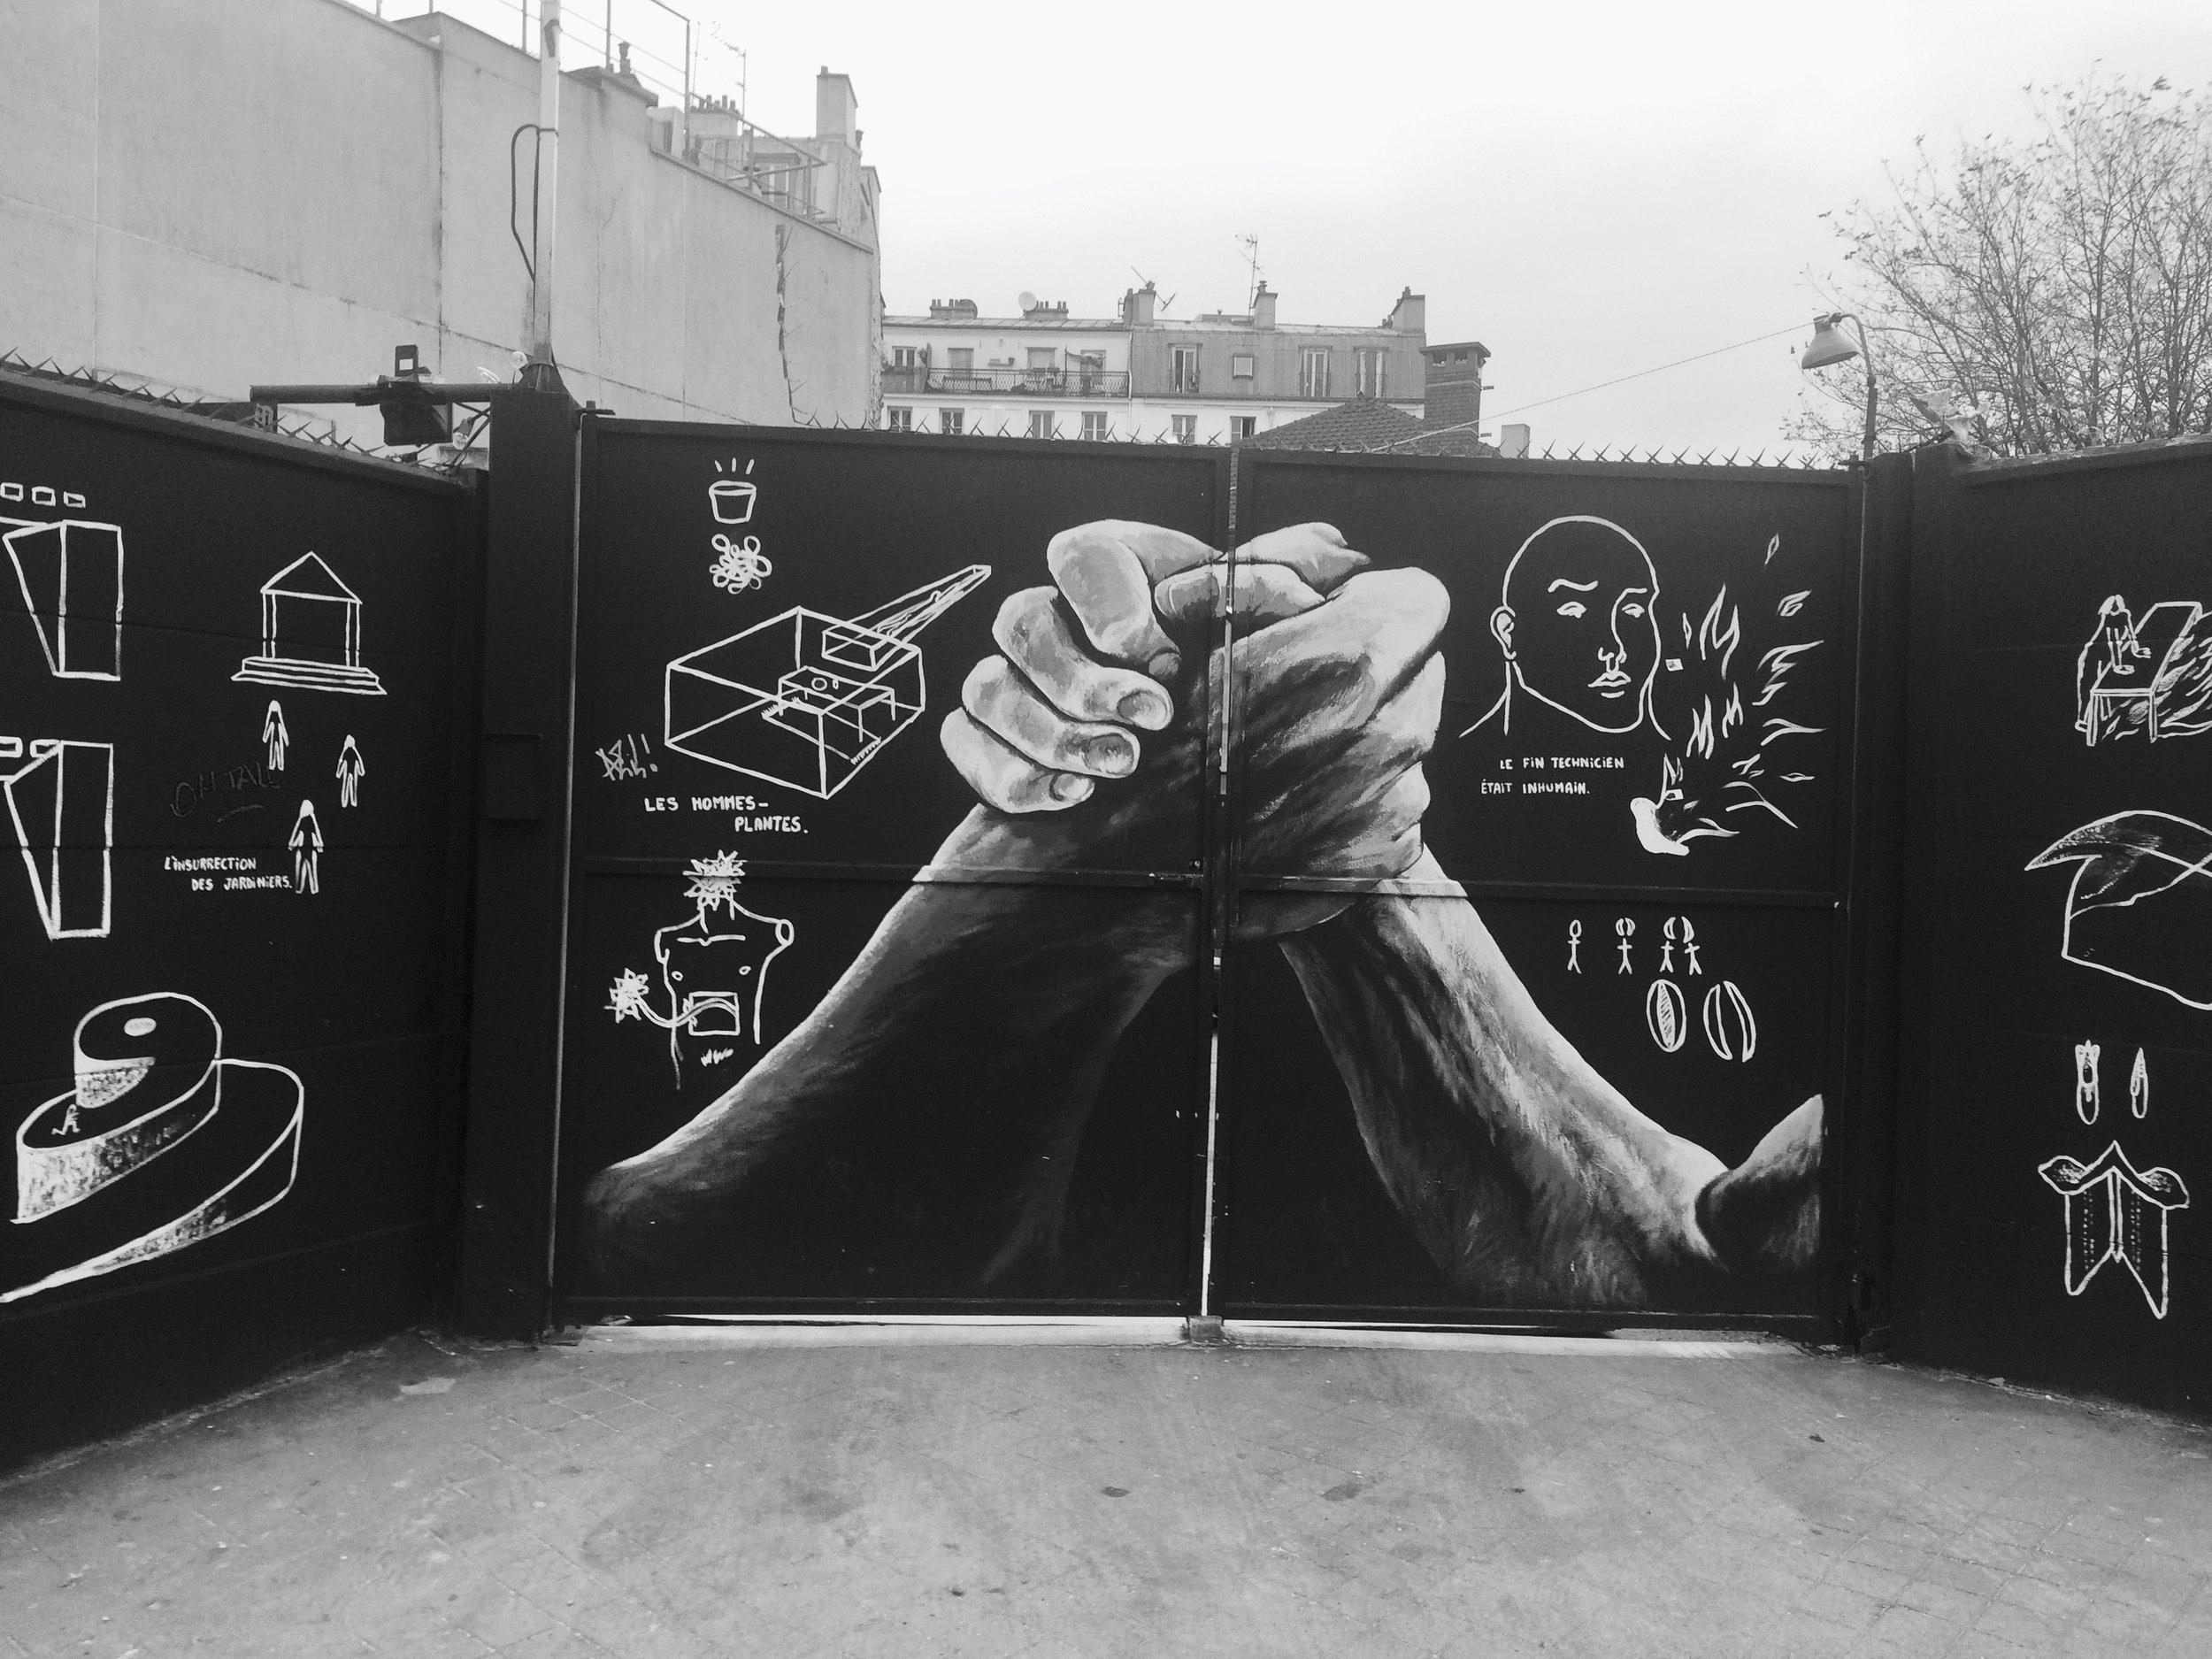 hands_clasped_art_paris_december_2017.jpg